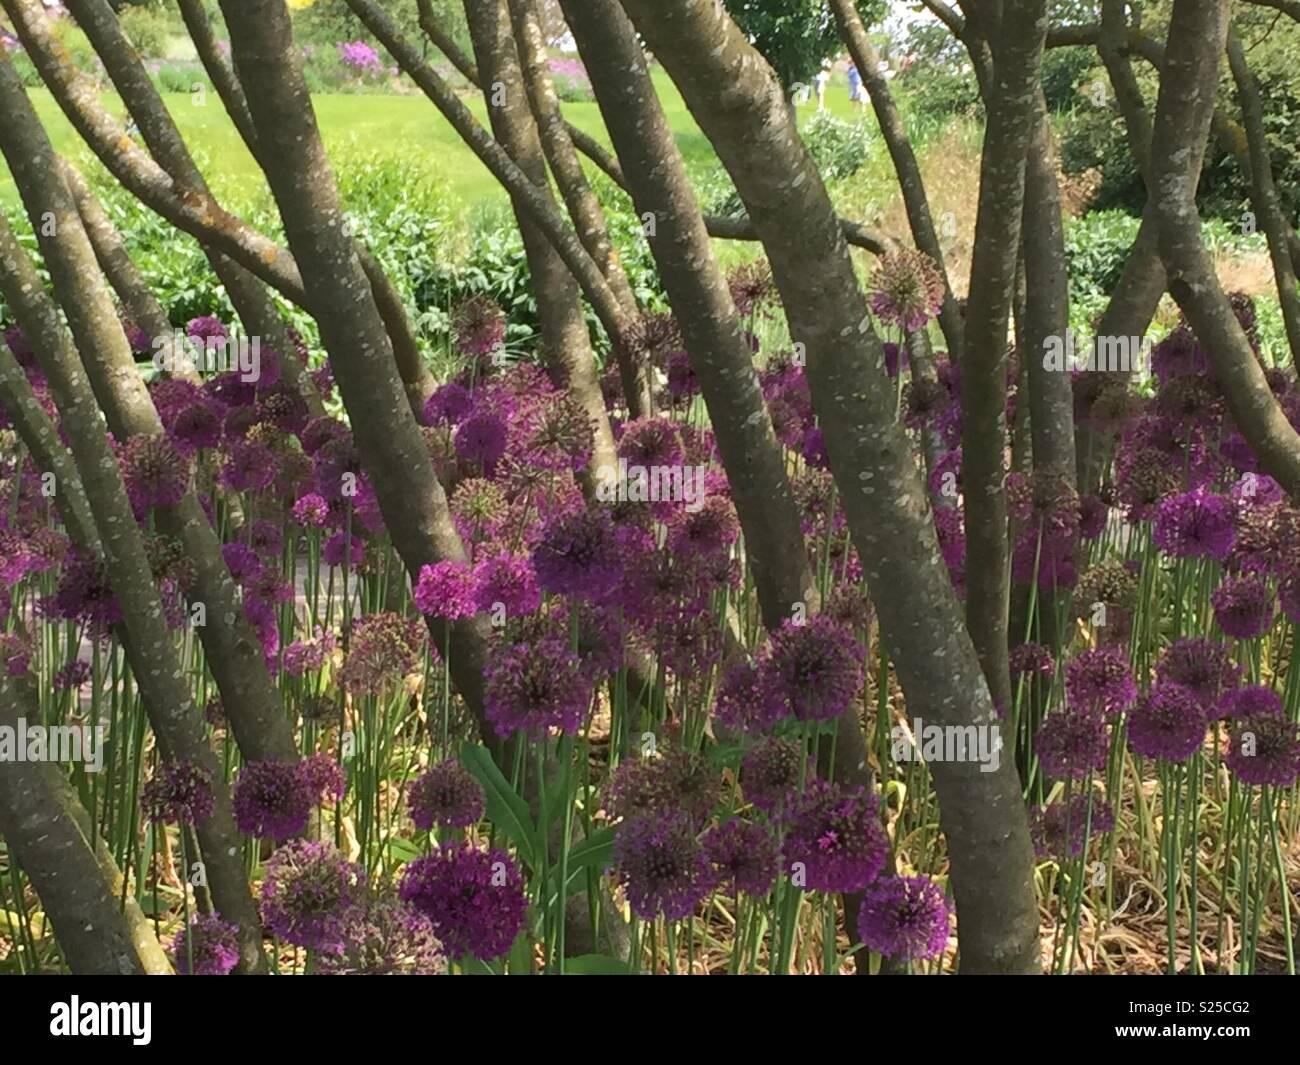 Purple alliums in trees - Stock Image